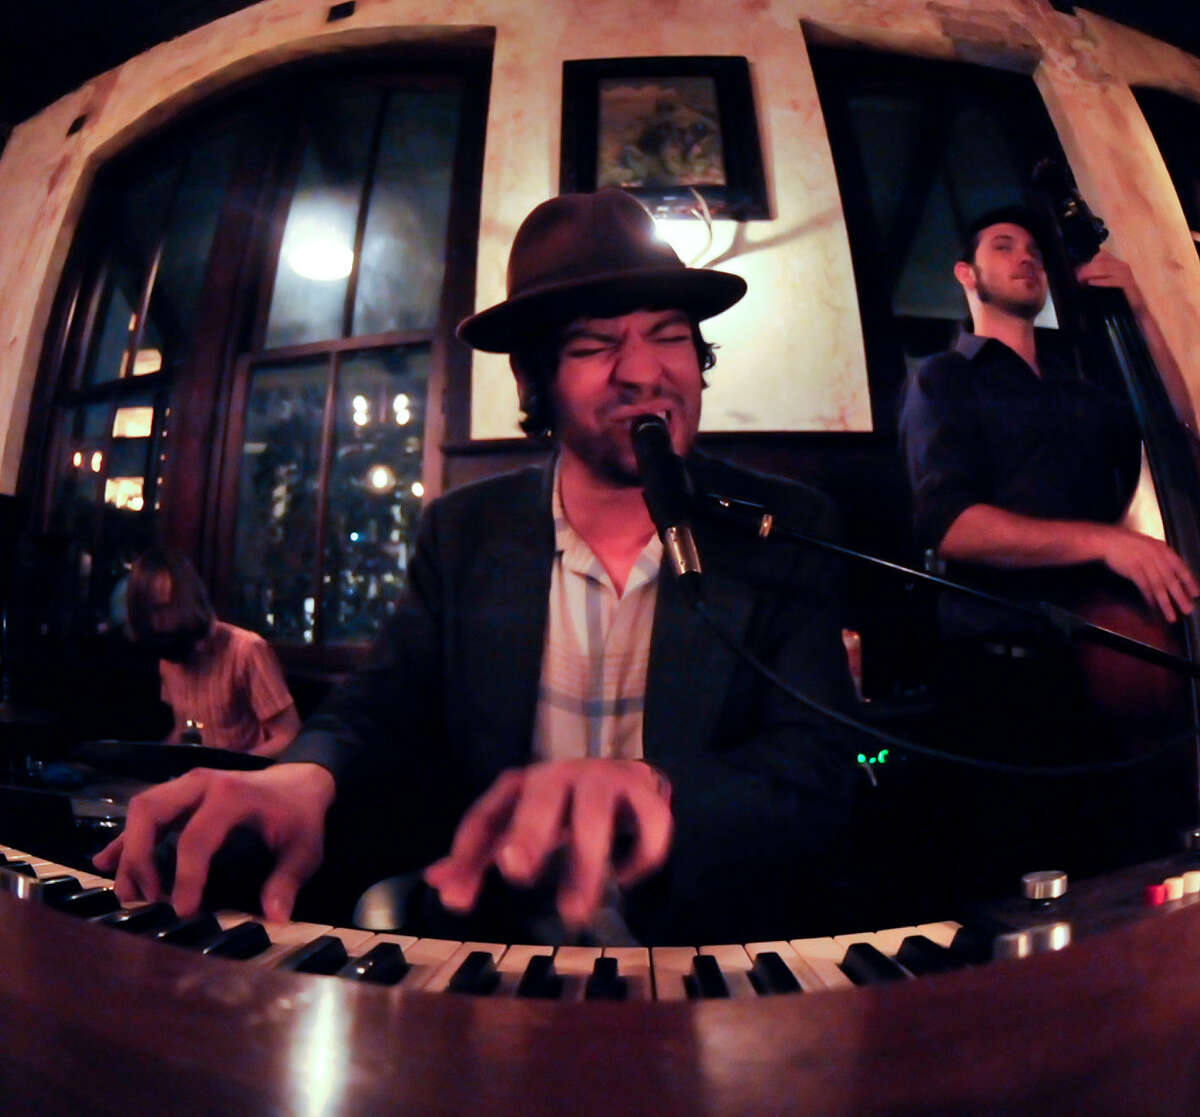 Cryin' D.T. Buffkin & the Bad Breath will play at Hi-Tones on Friday.